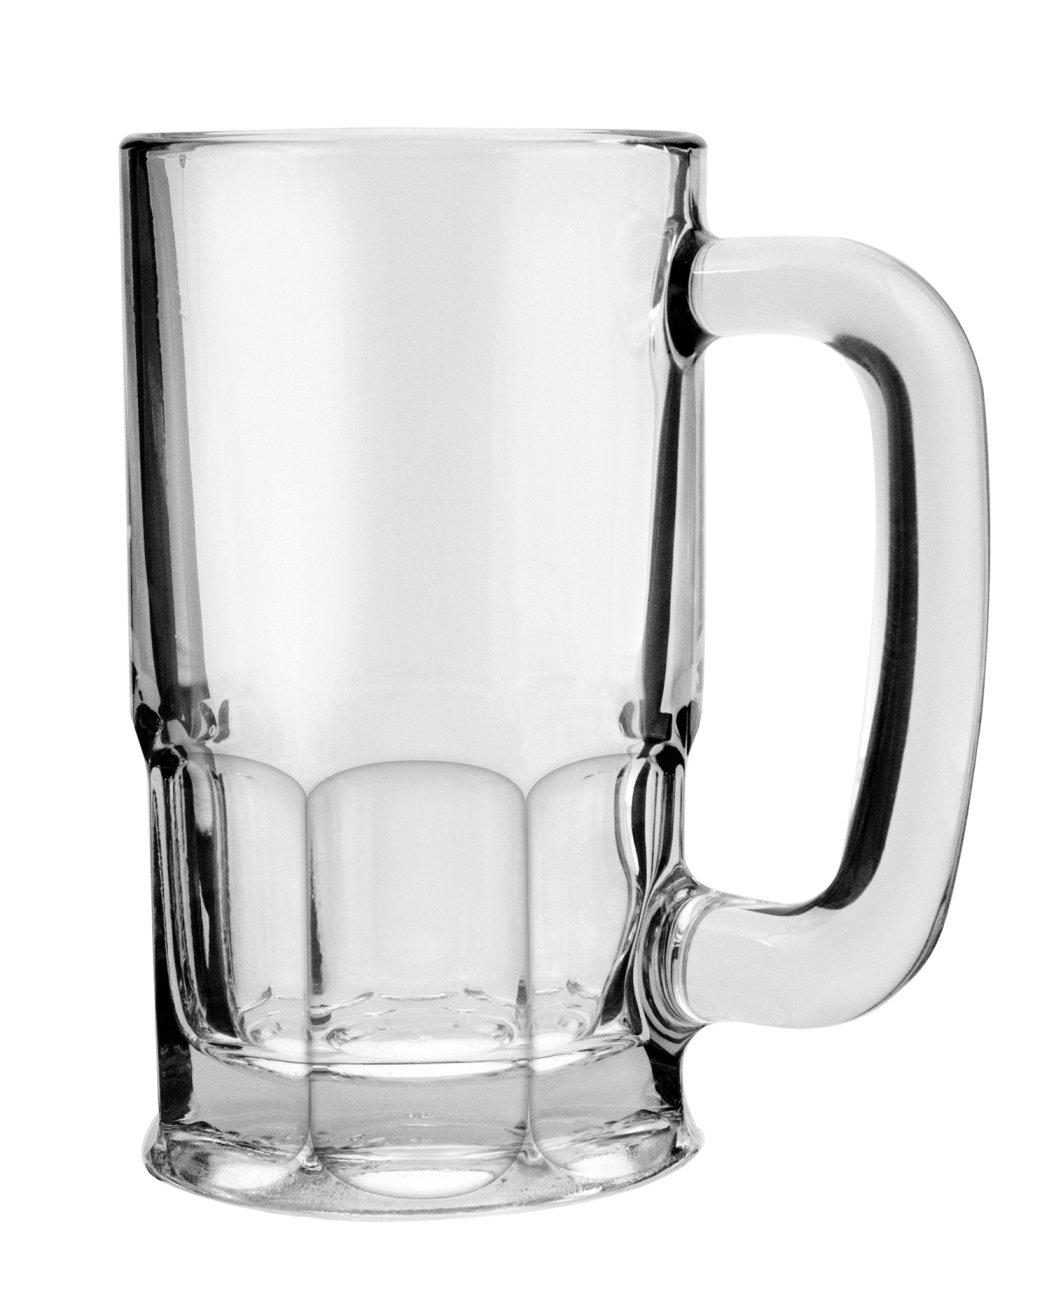 Beer Glass Mug Steins Drinking Glassware Drinkware Barware Party Cafe ...